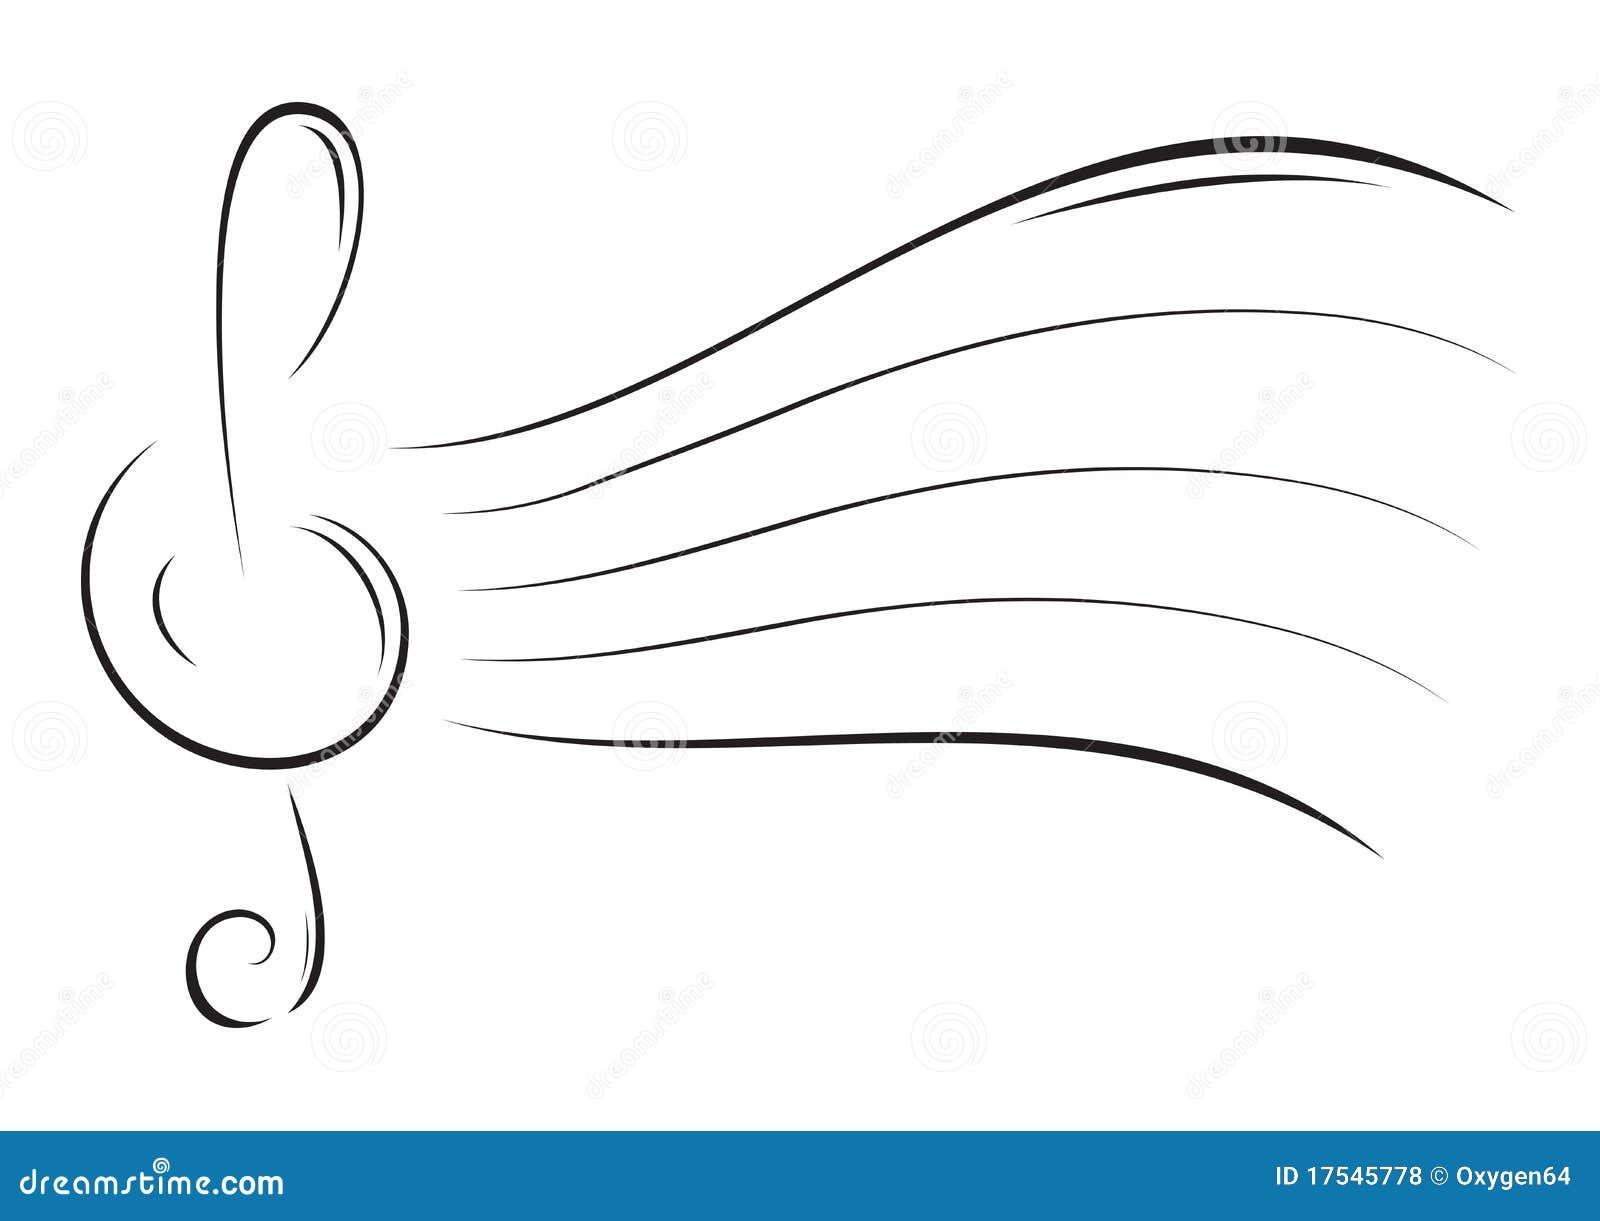 Music Sketch Royalty Free Stock Photos Image 17545778